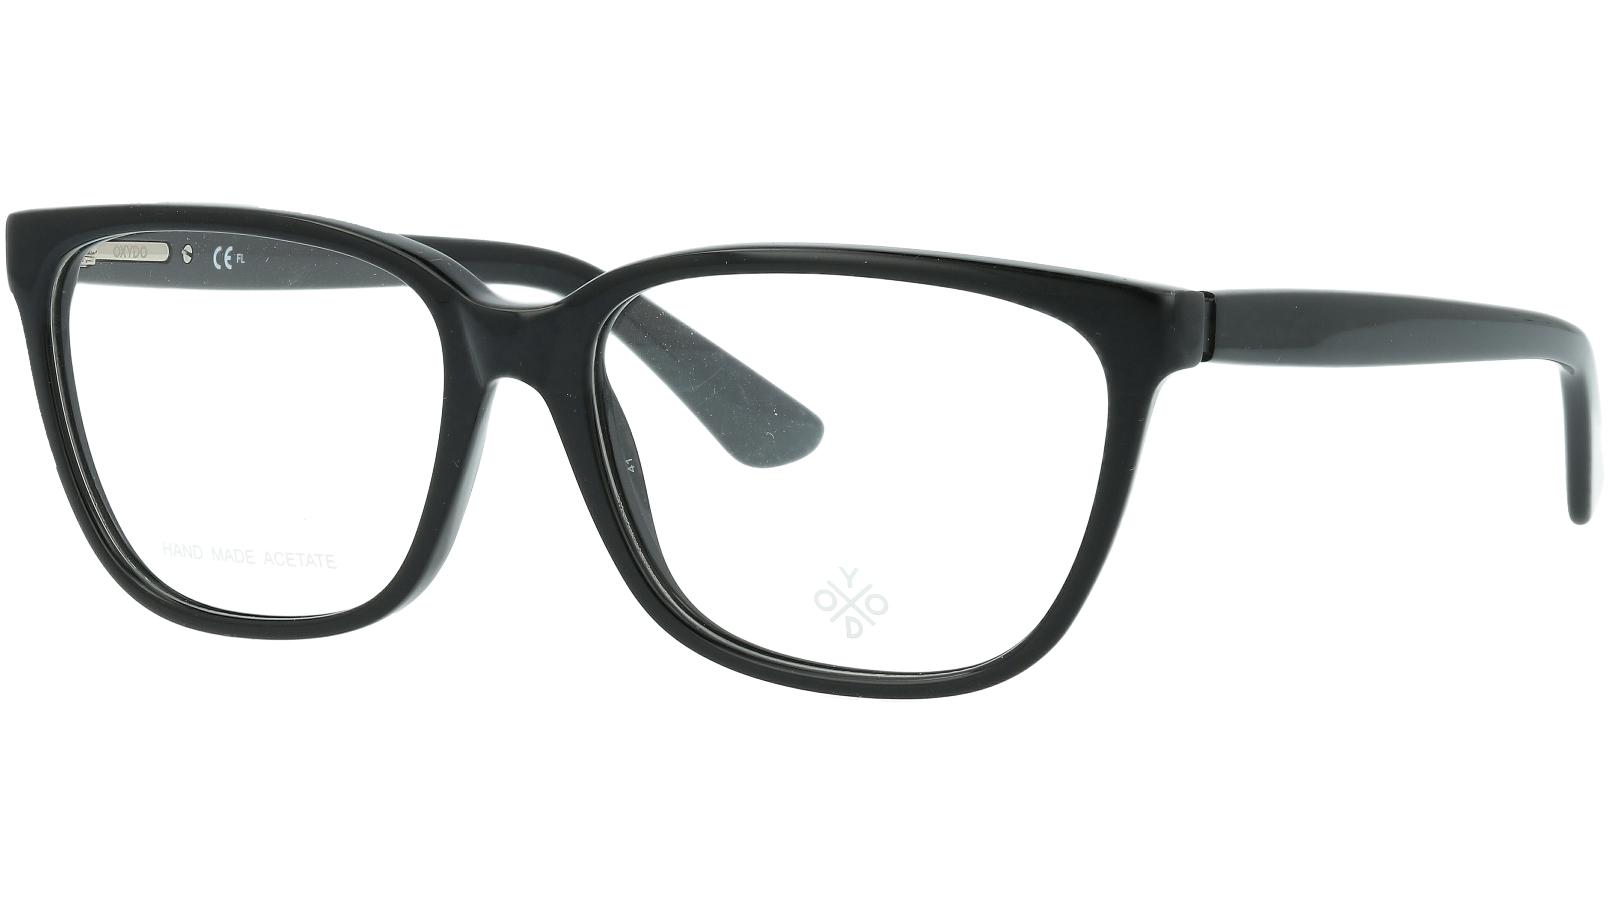 Oxydo OX545 807 54 Black Glasses